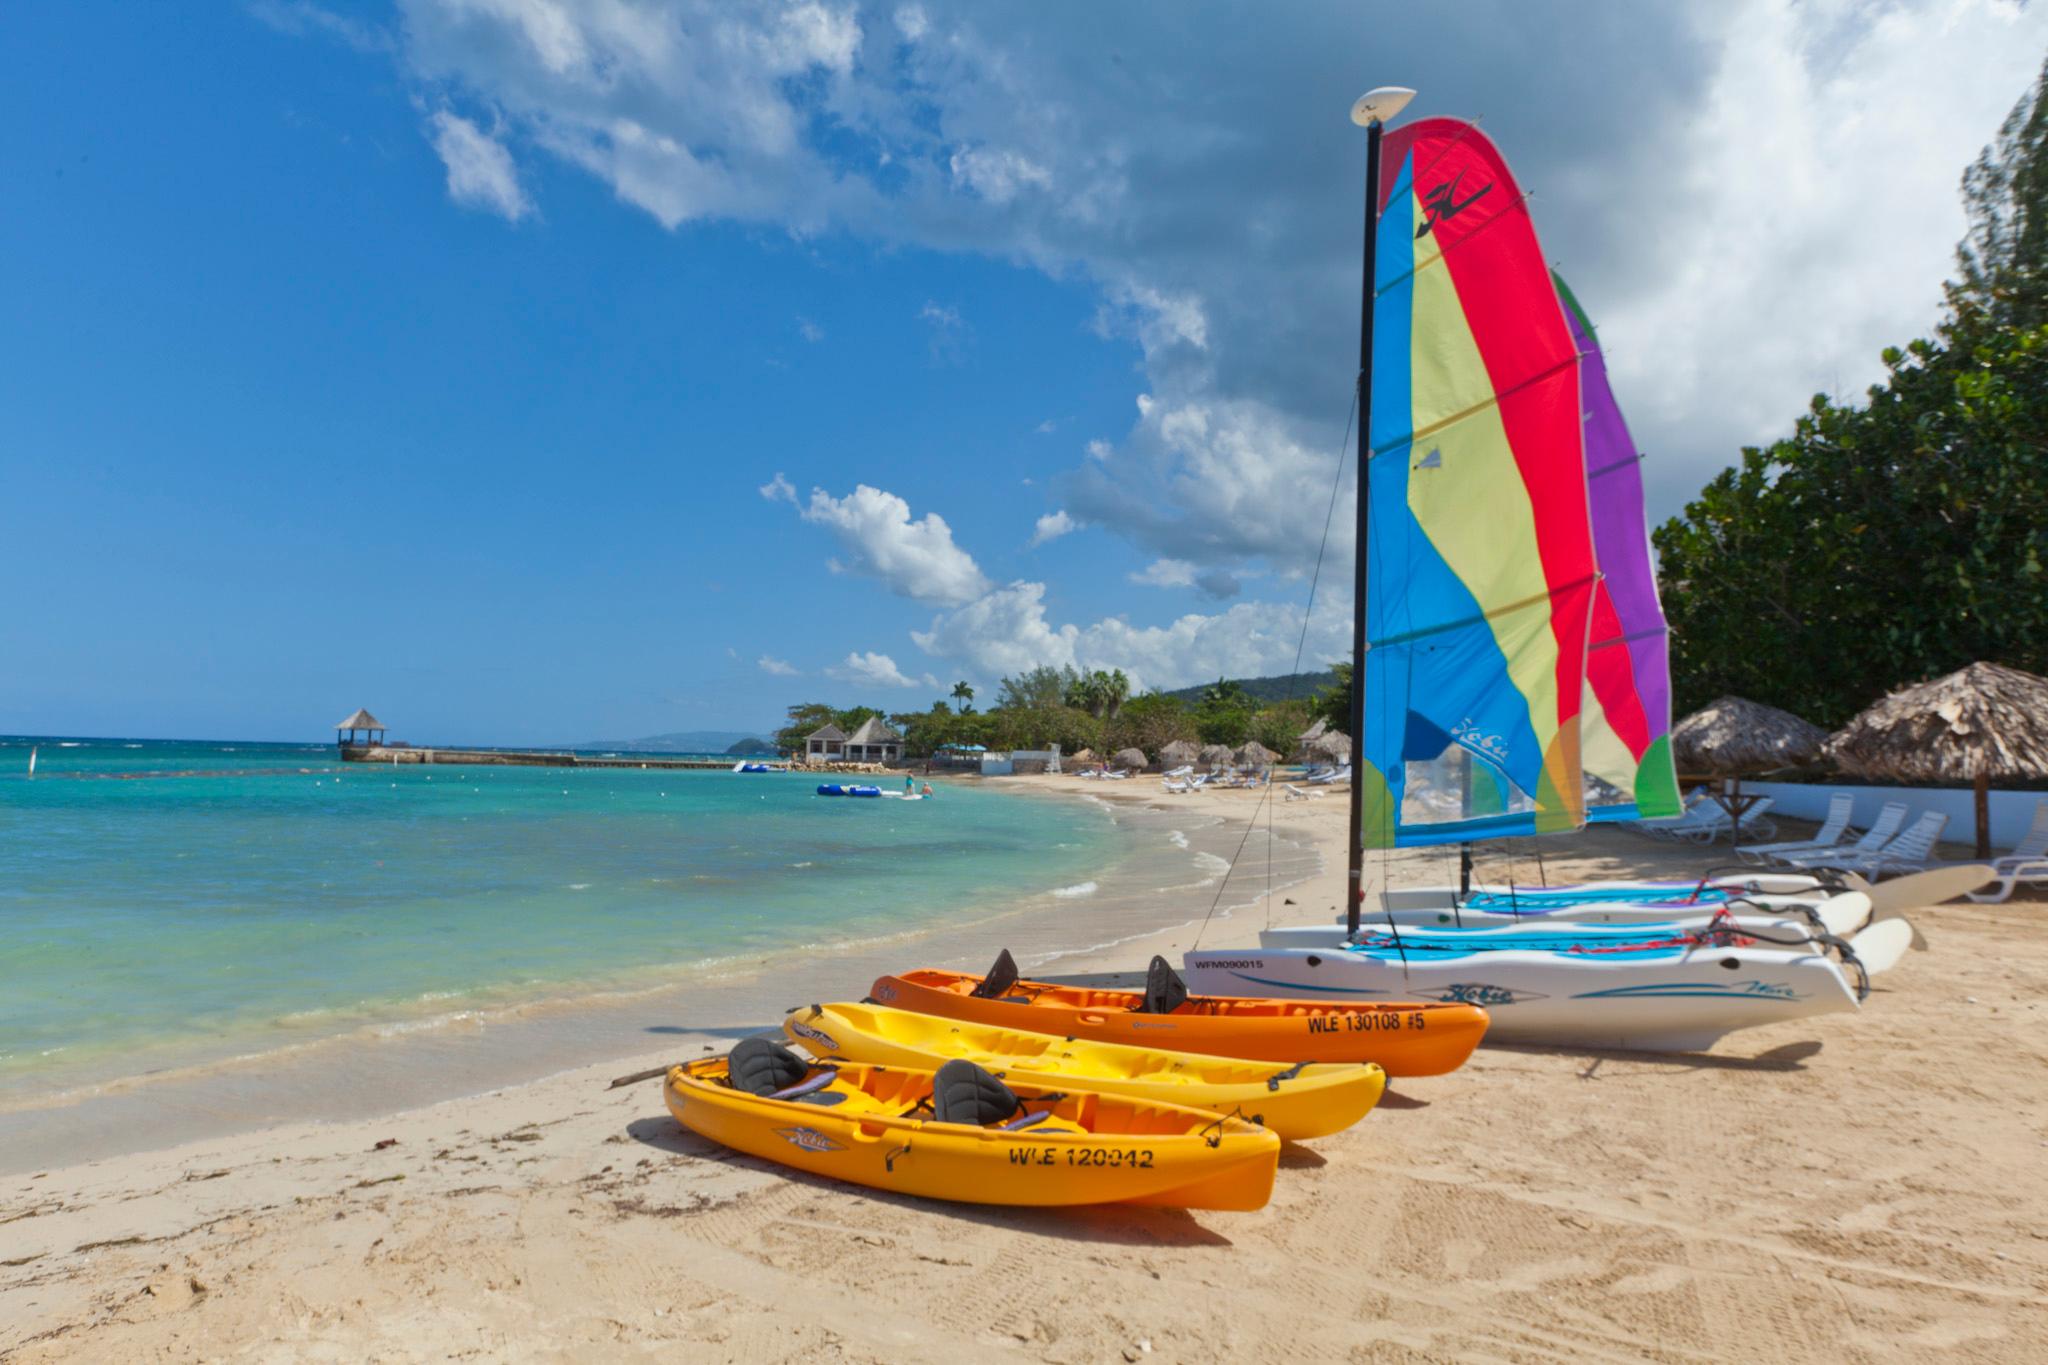 Water Sports - Kayaks, sailing, sunfish, snorkeling, all on-site.